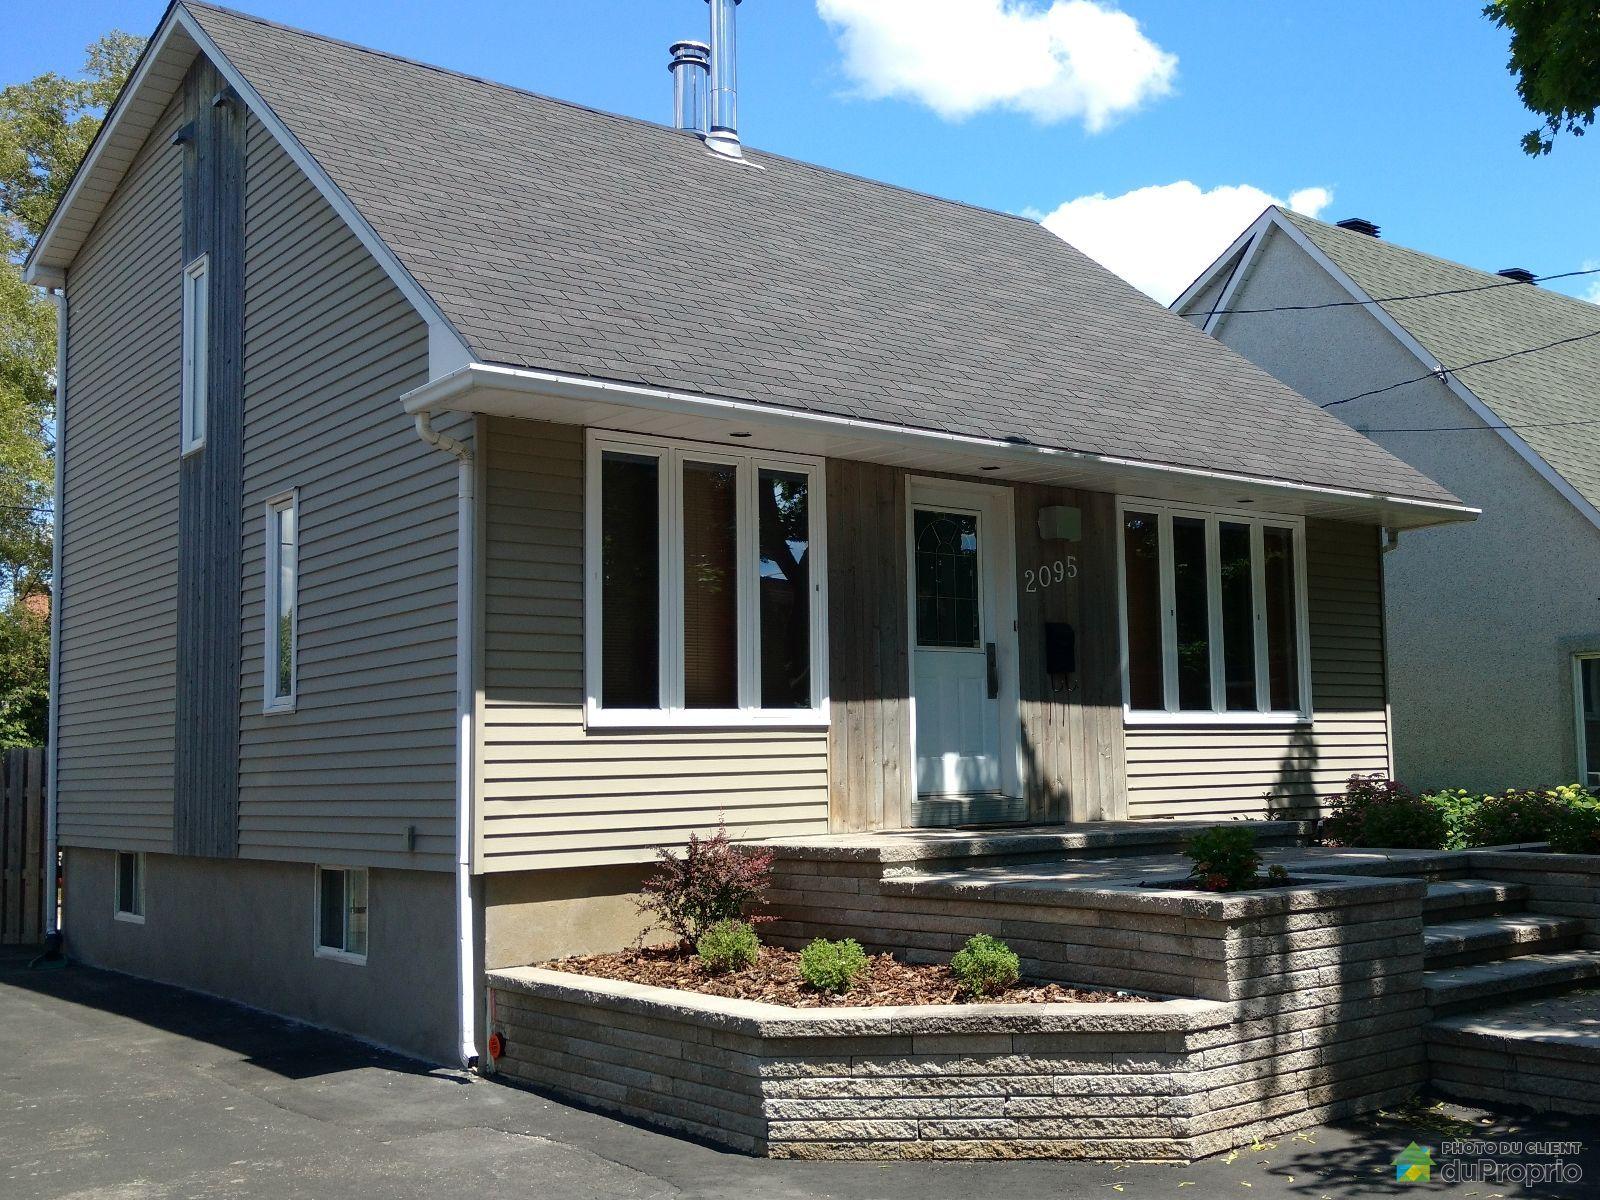 maison vendre montr al 2095 rue patricia immobilier. Black Bedroom Furniture Sets. Home Design Ideas